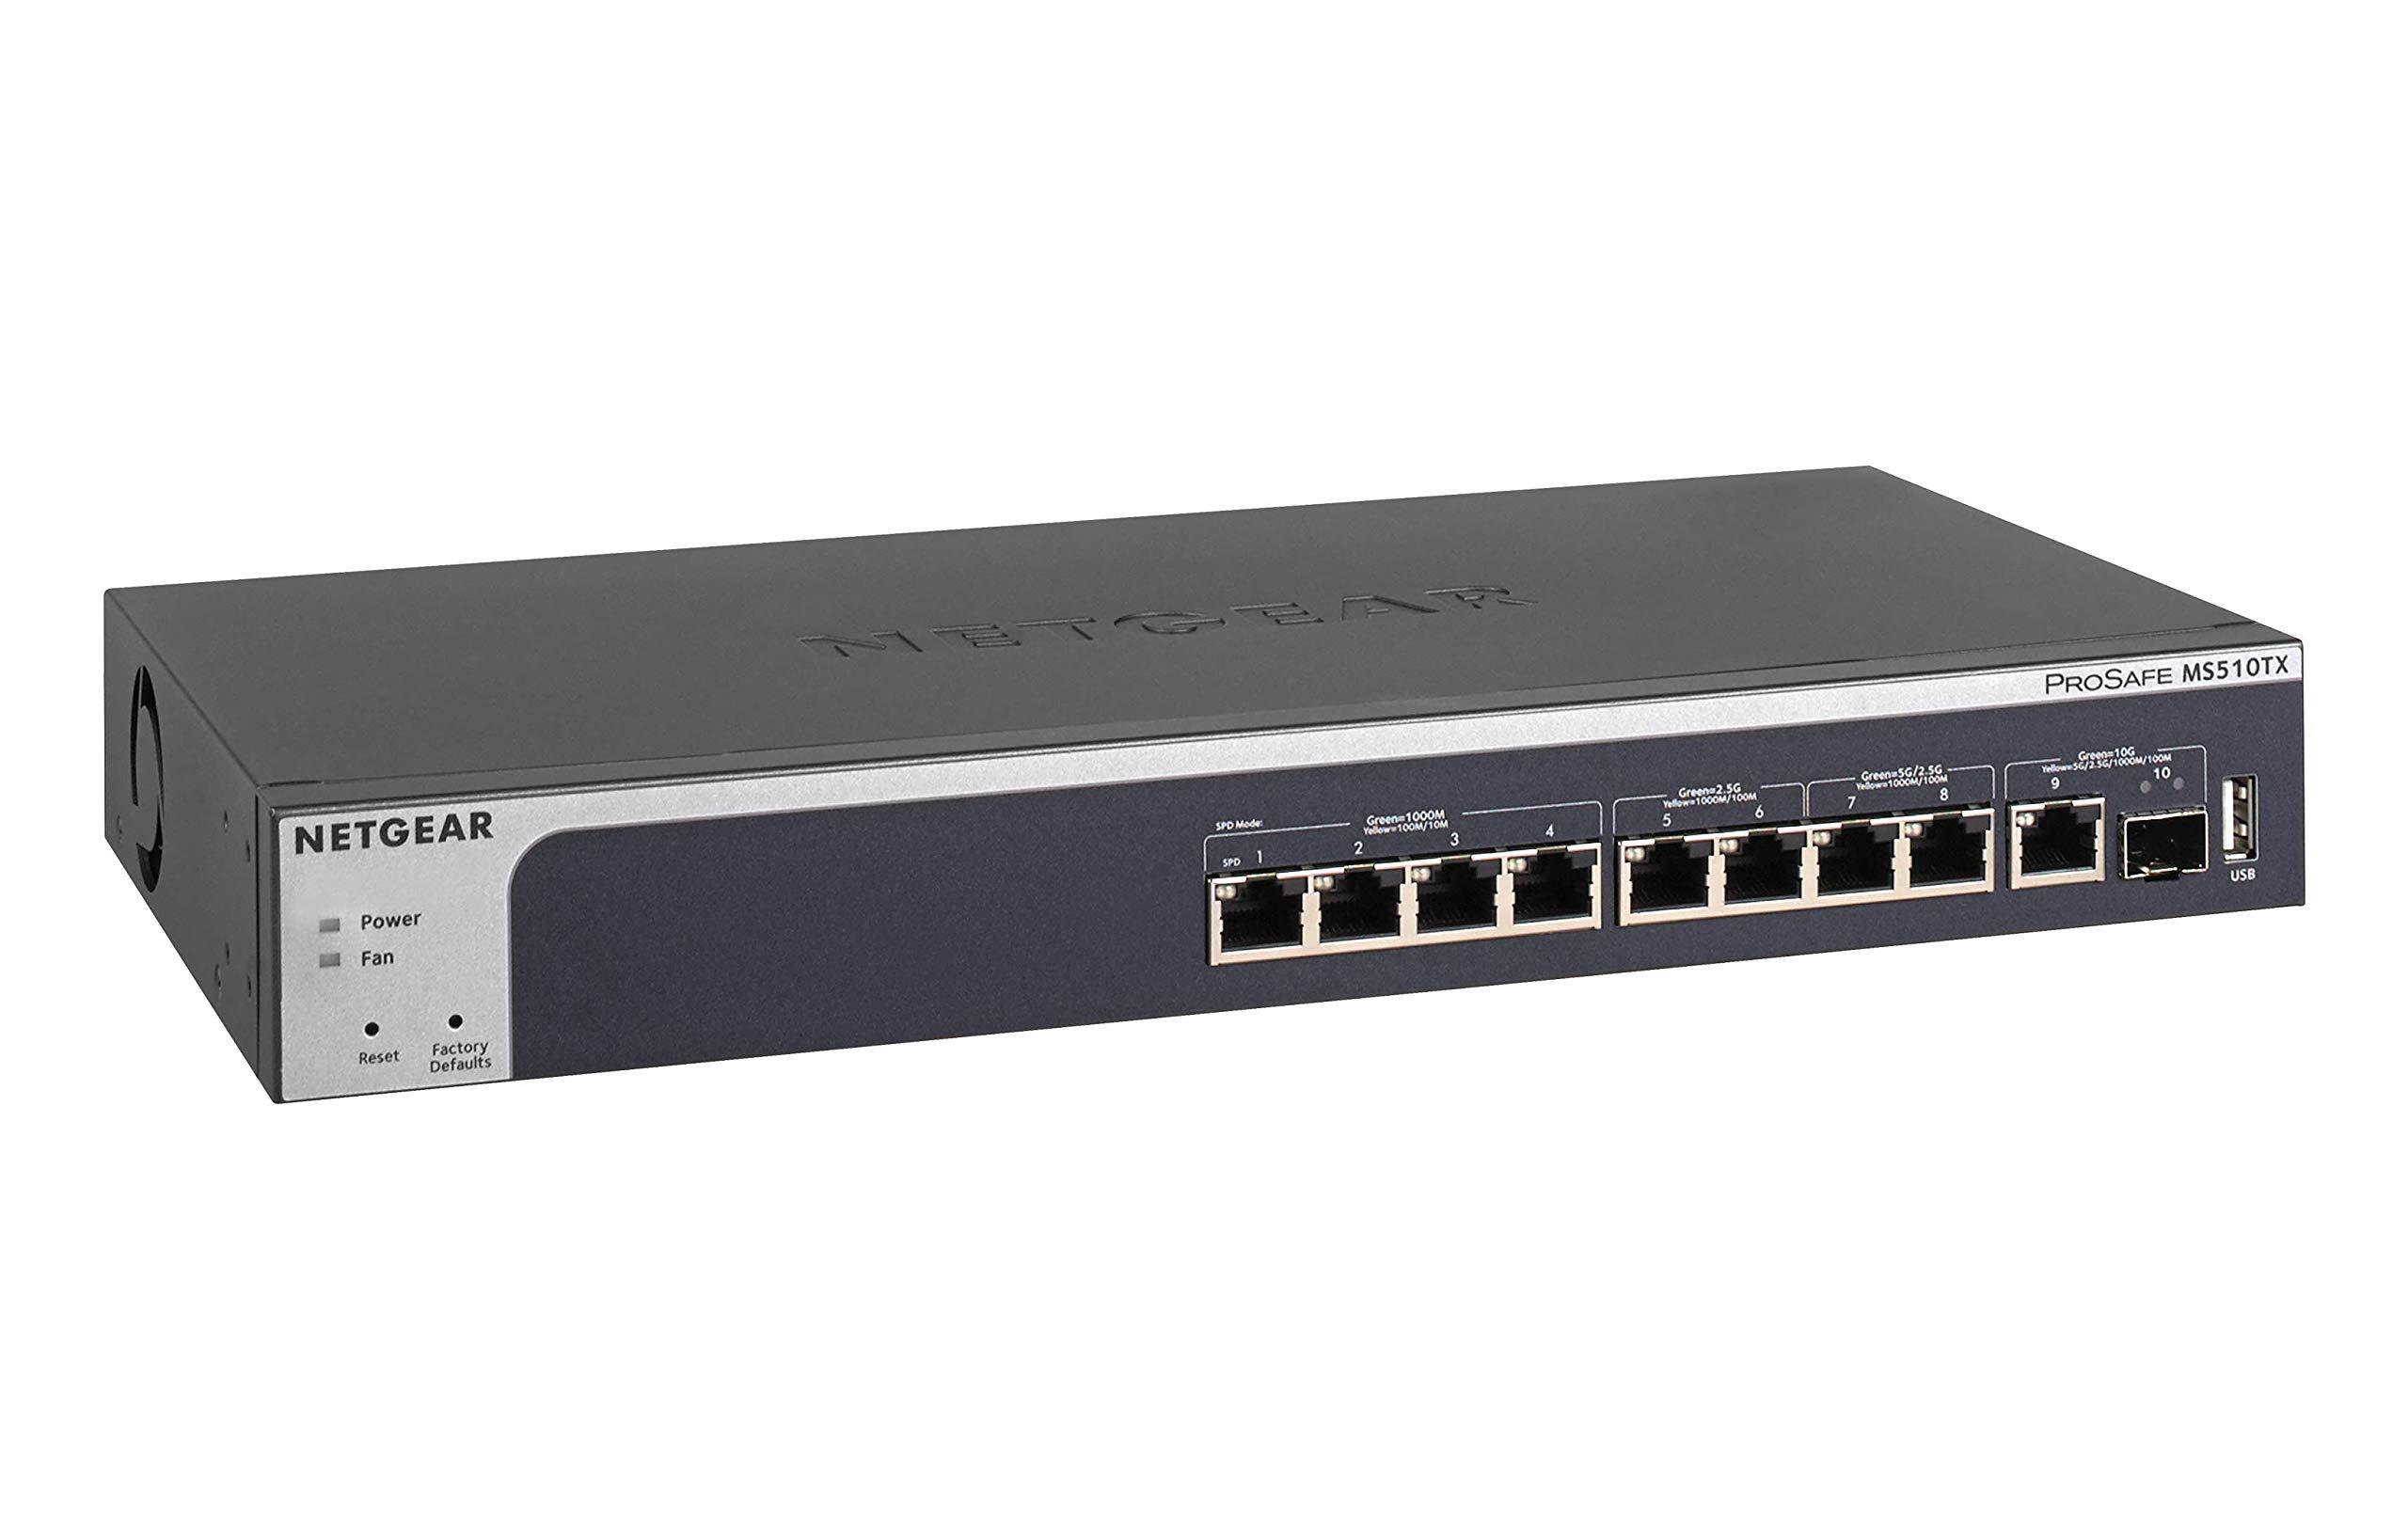 BS-G2116U Buffalo 16-Port Desktop//Rackmount Gigabit Green Ethernet Switch